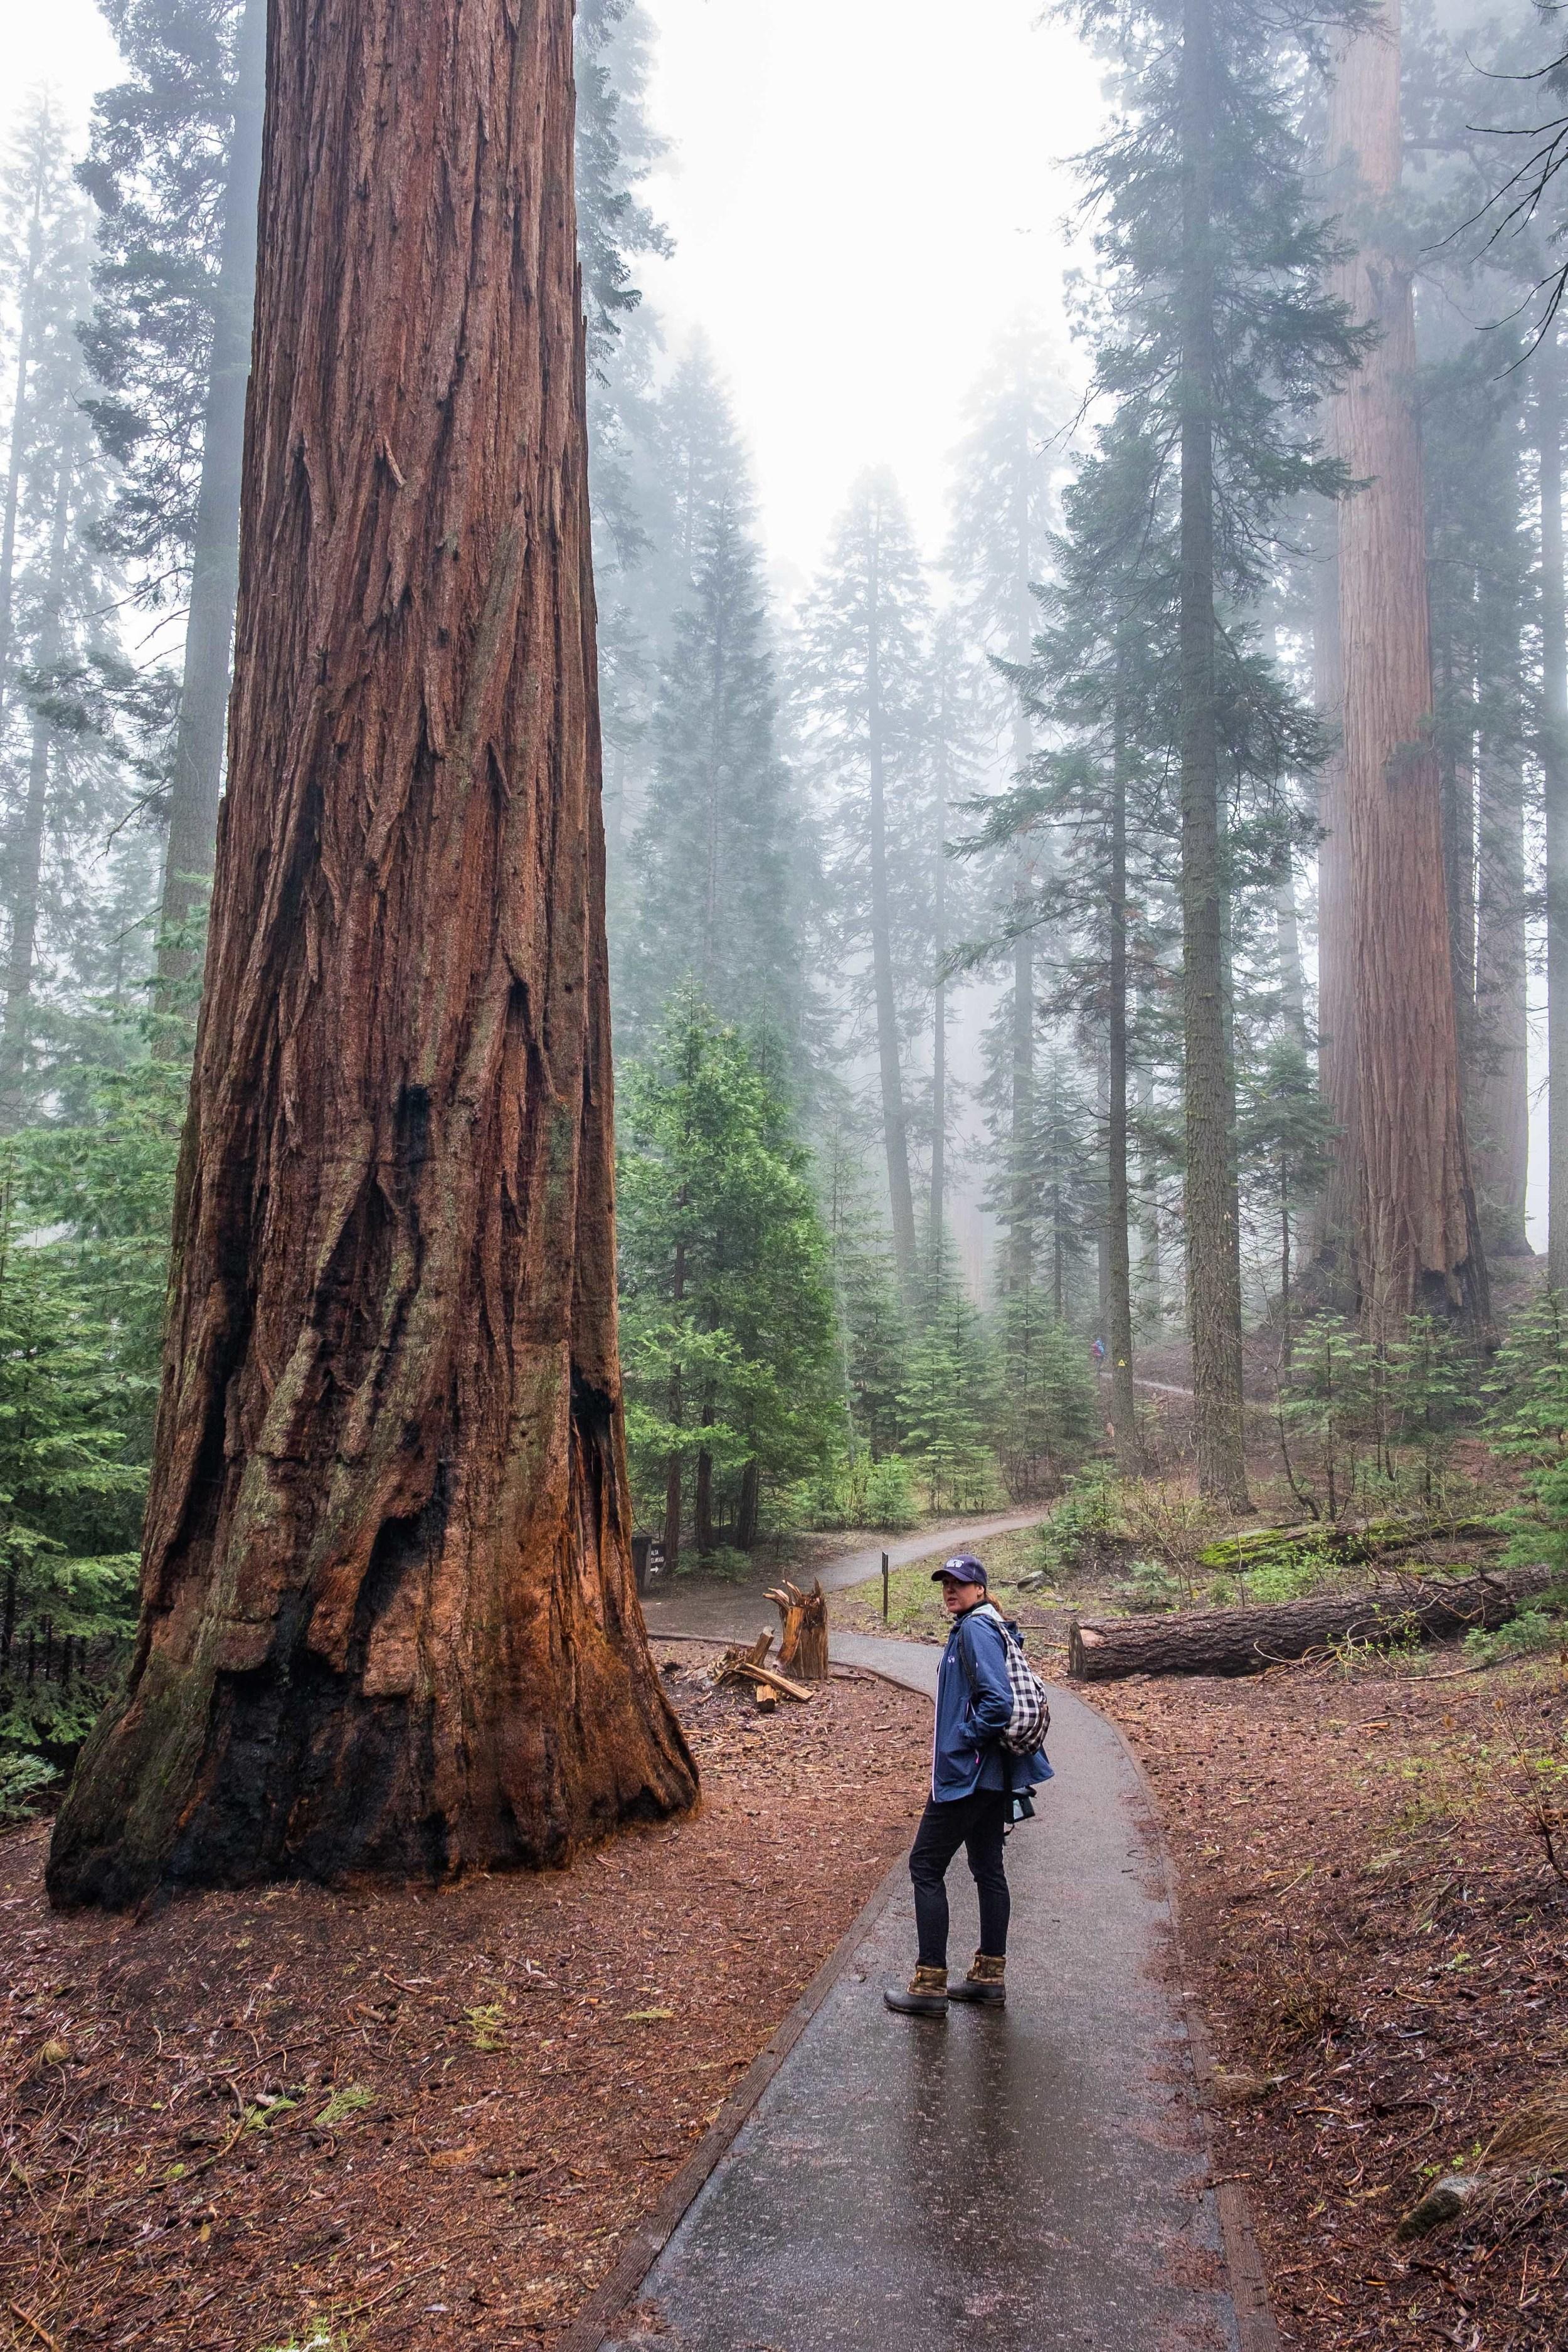 20160507-JI-Sequoia National Park-_DSF9309.jpg